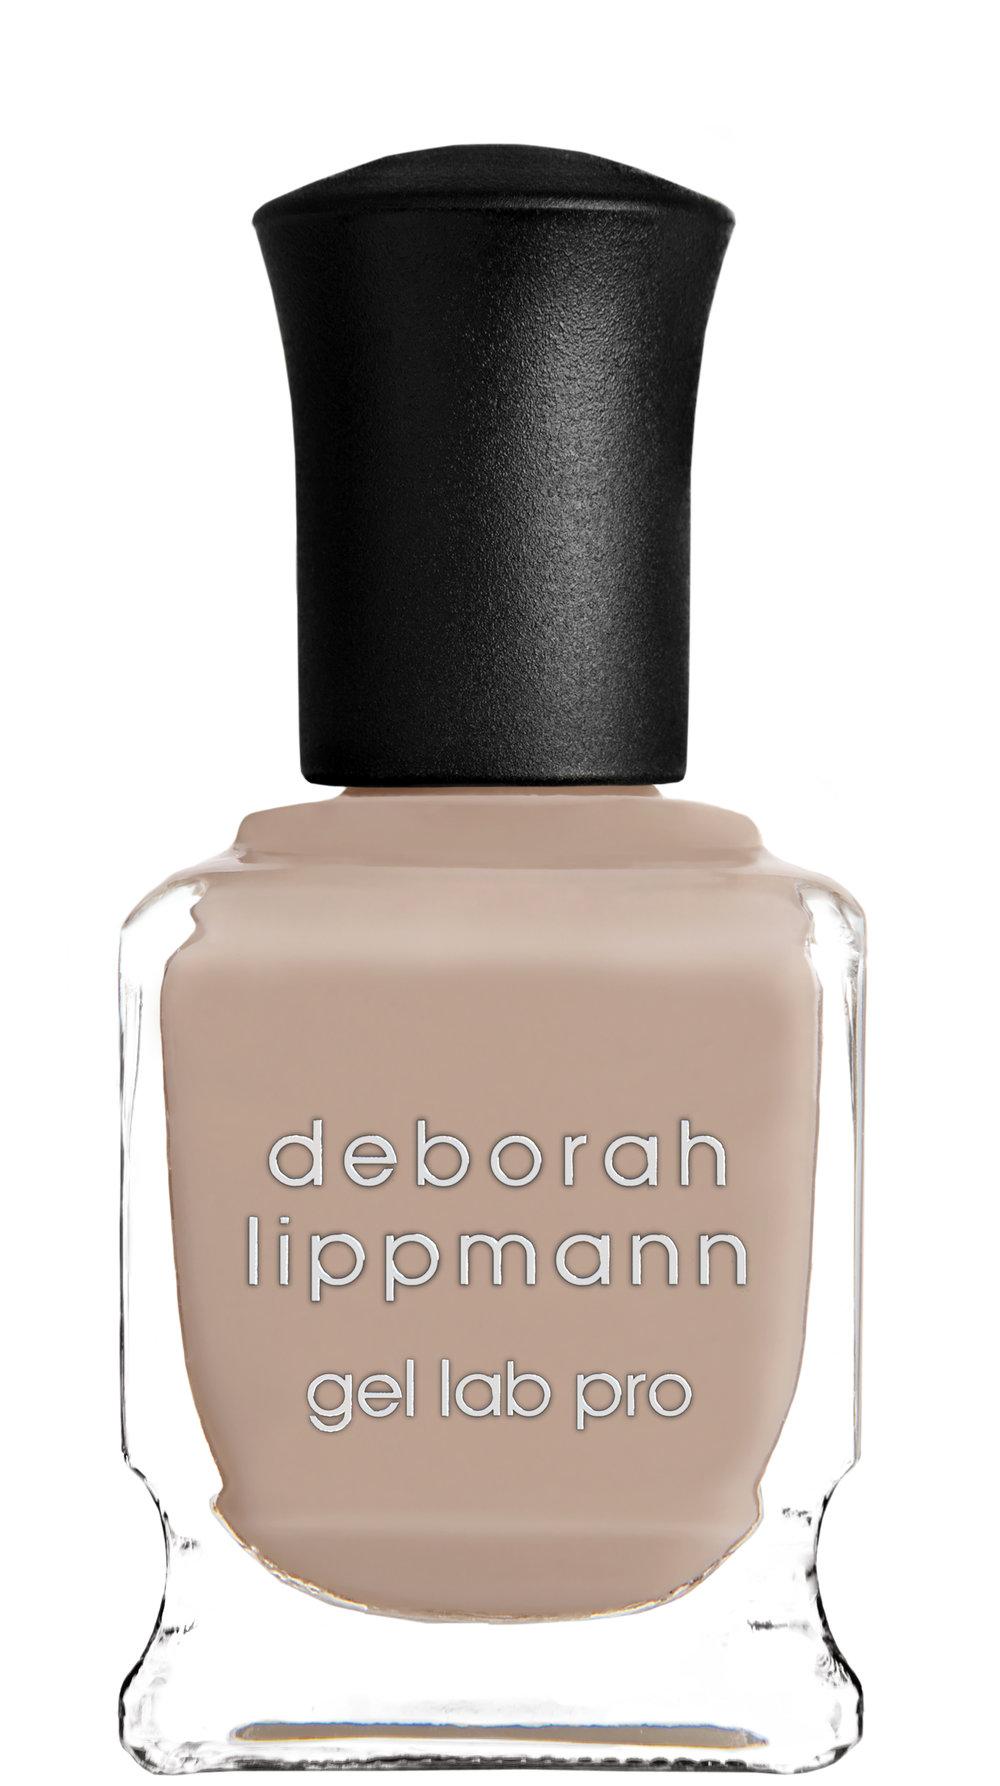 Deborah Lippman Brand New Day Nail Polish,$20, at DeborahLippmann.com